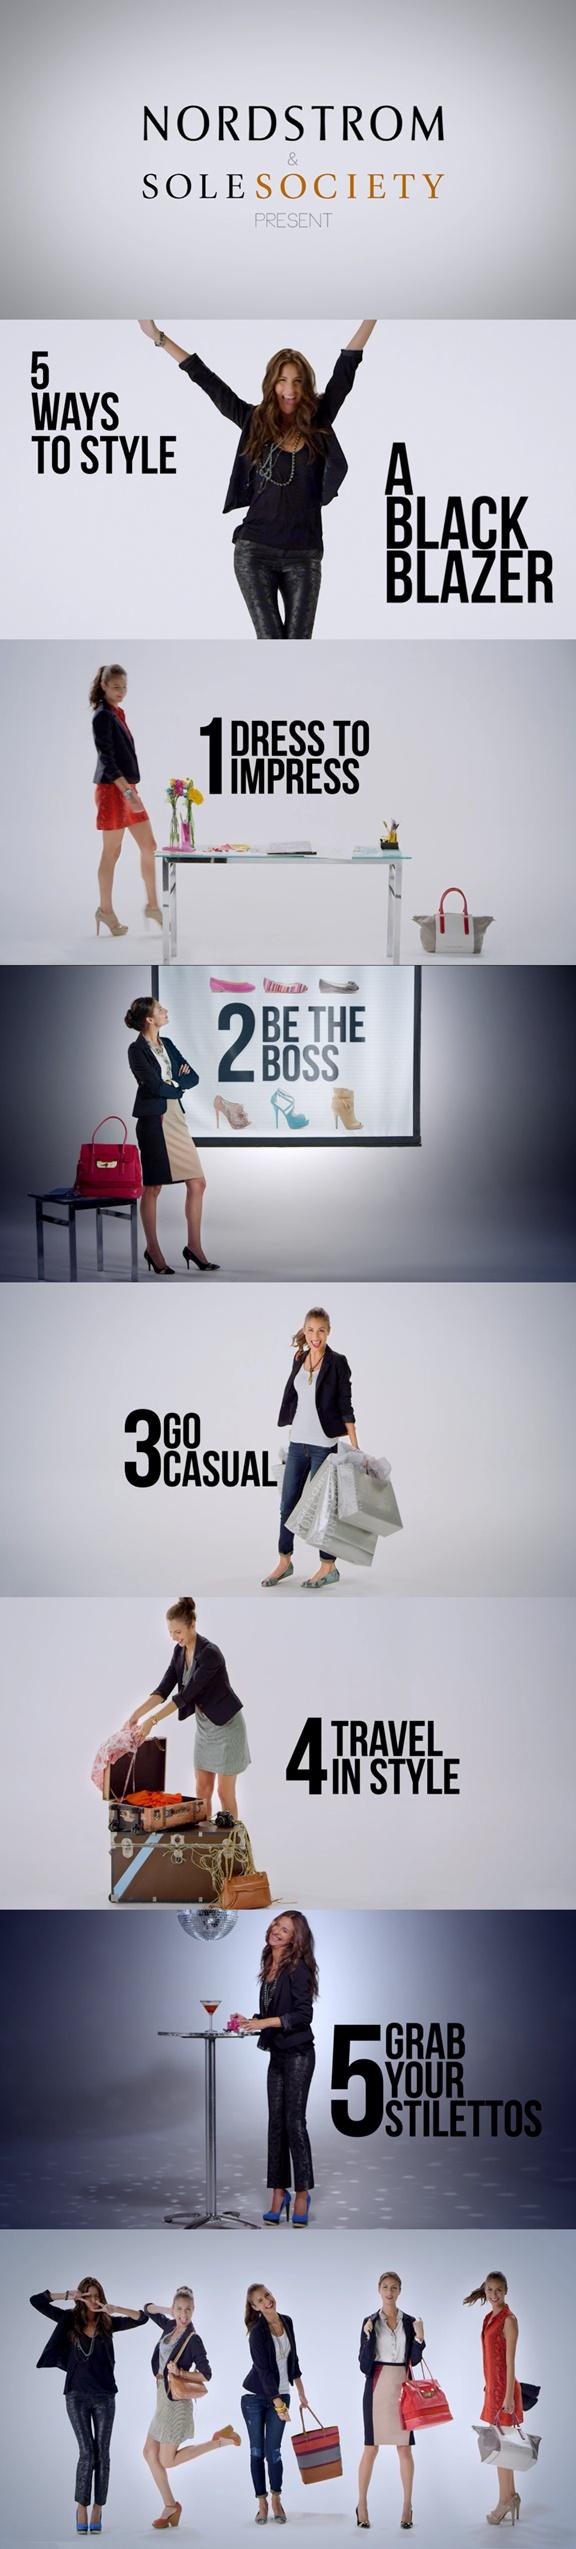 5 Ways to Style a Black Blazer via @Nordstrom & @SoleSociety